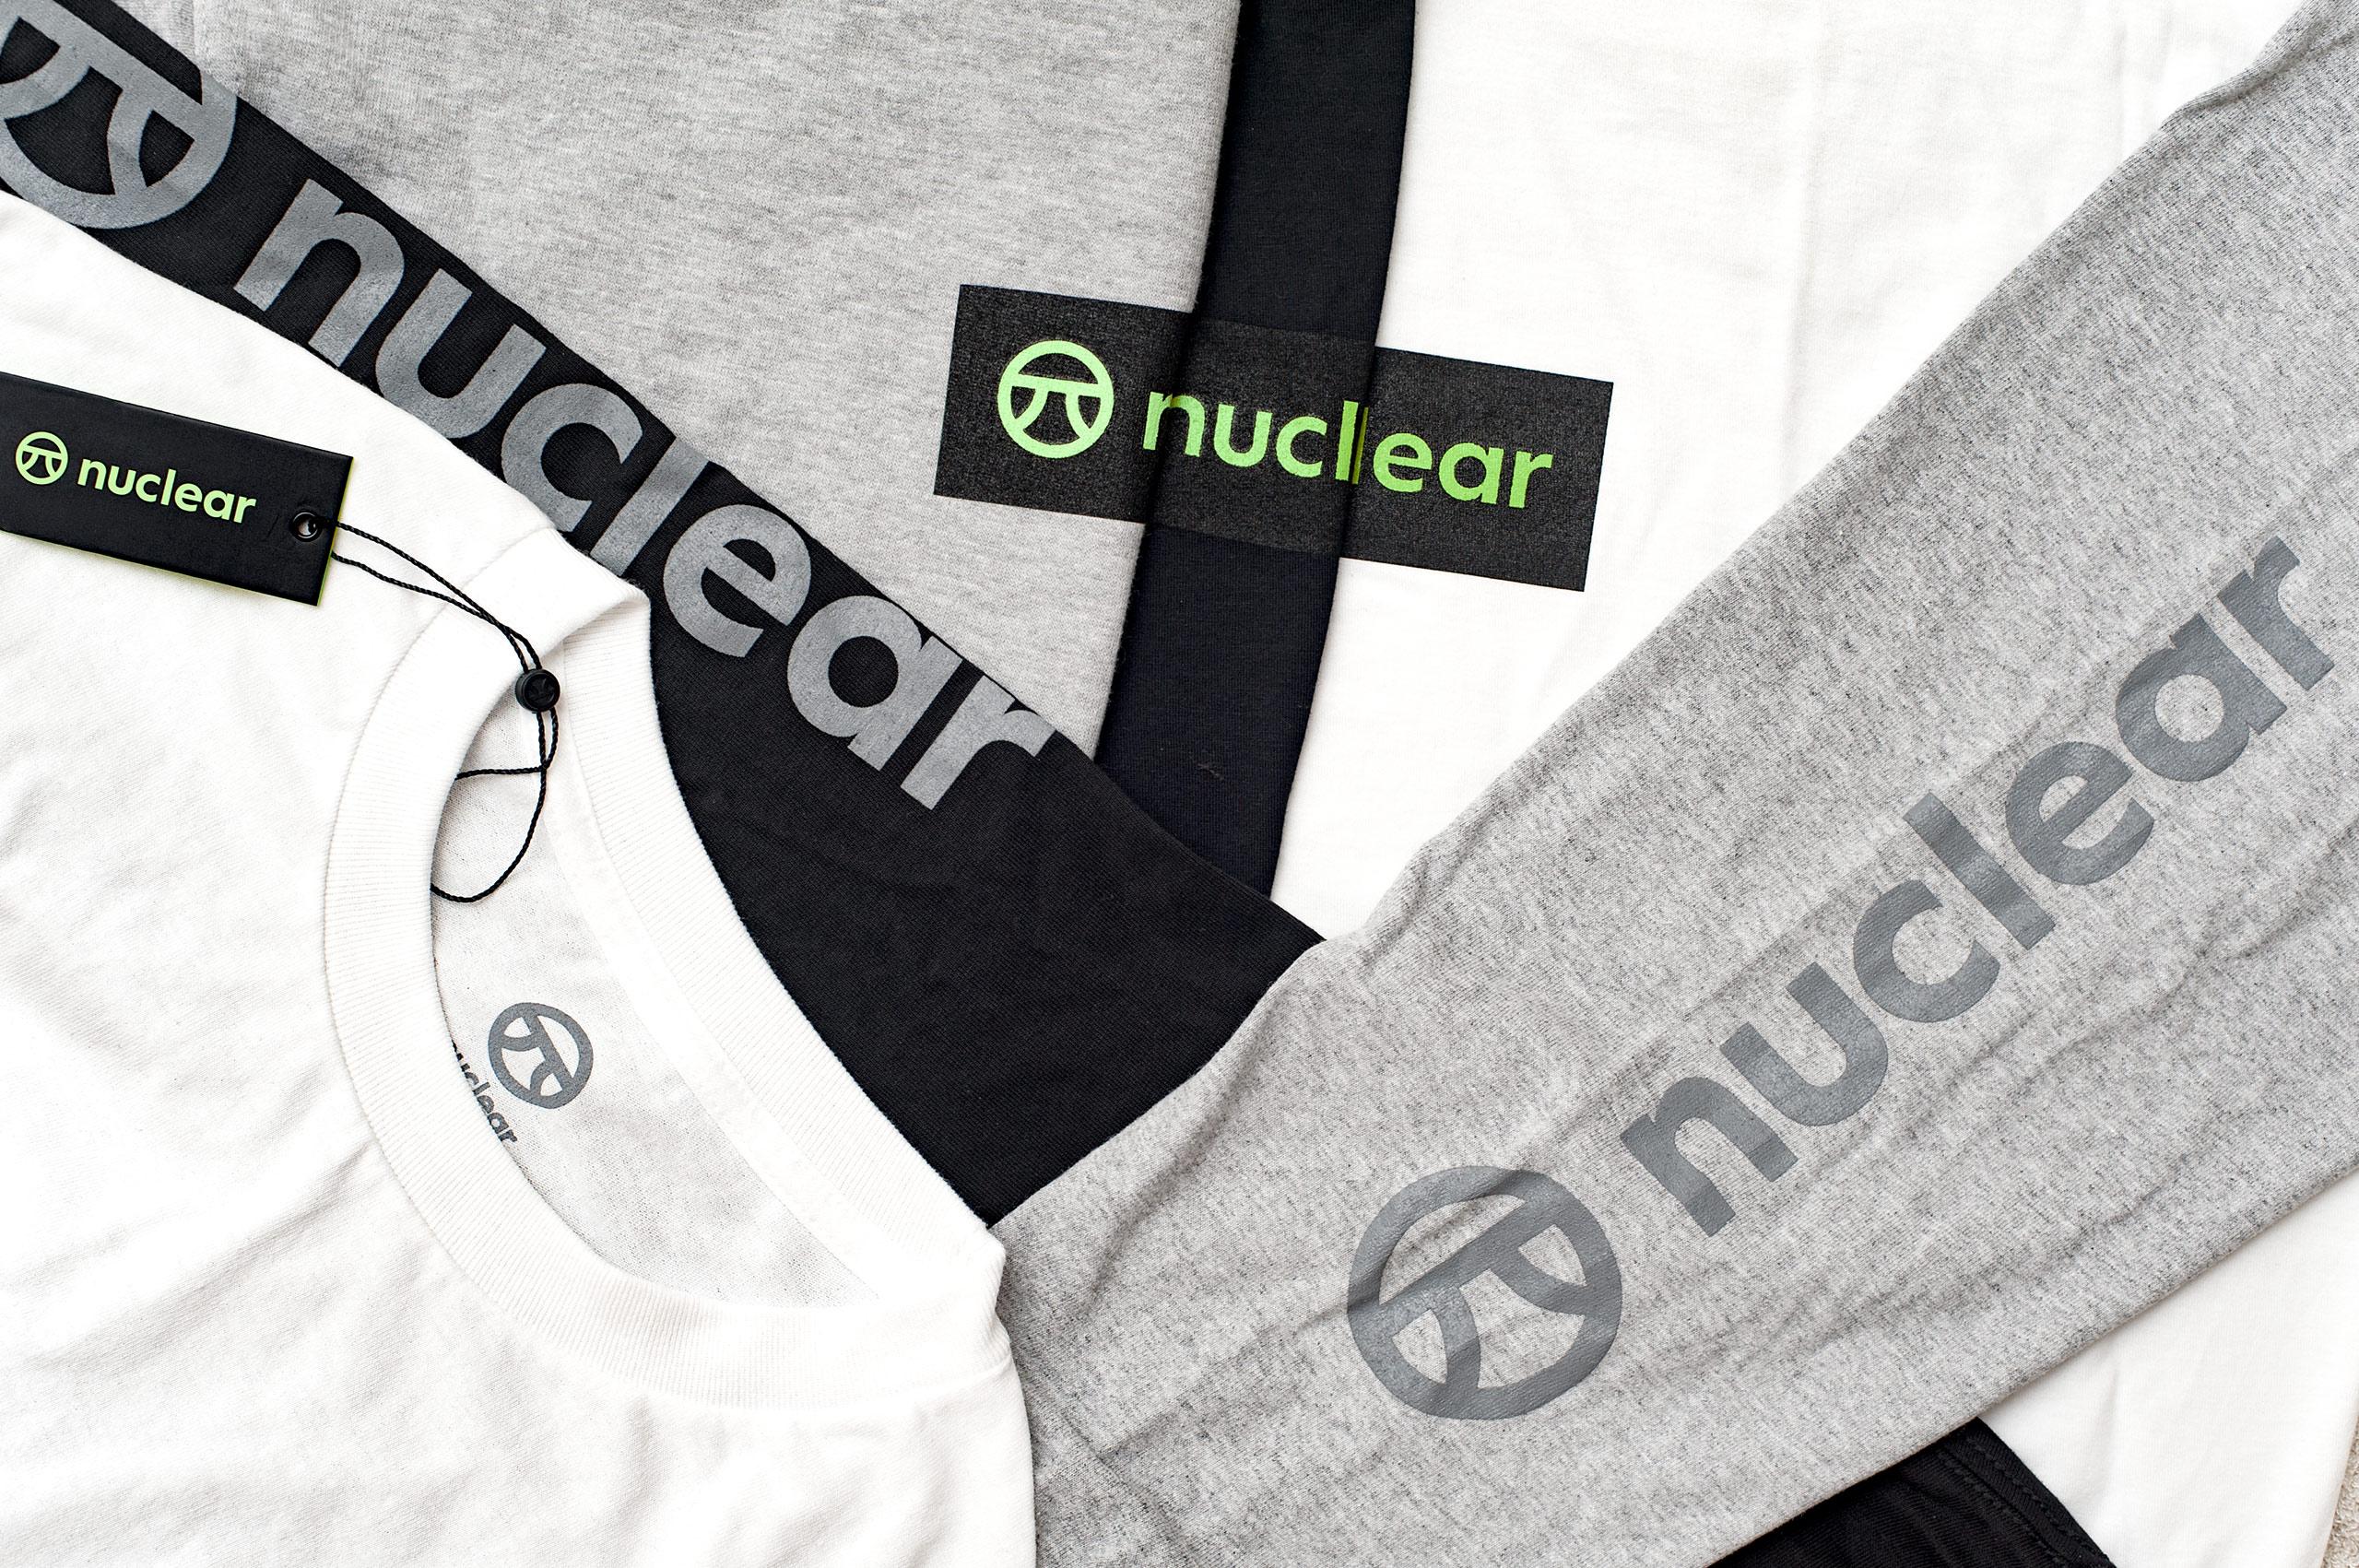 09-Wear-Nuclear